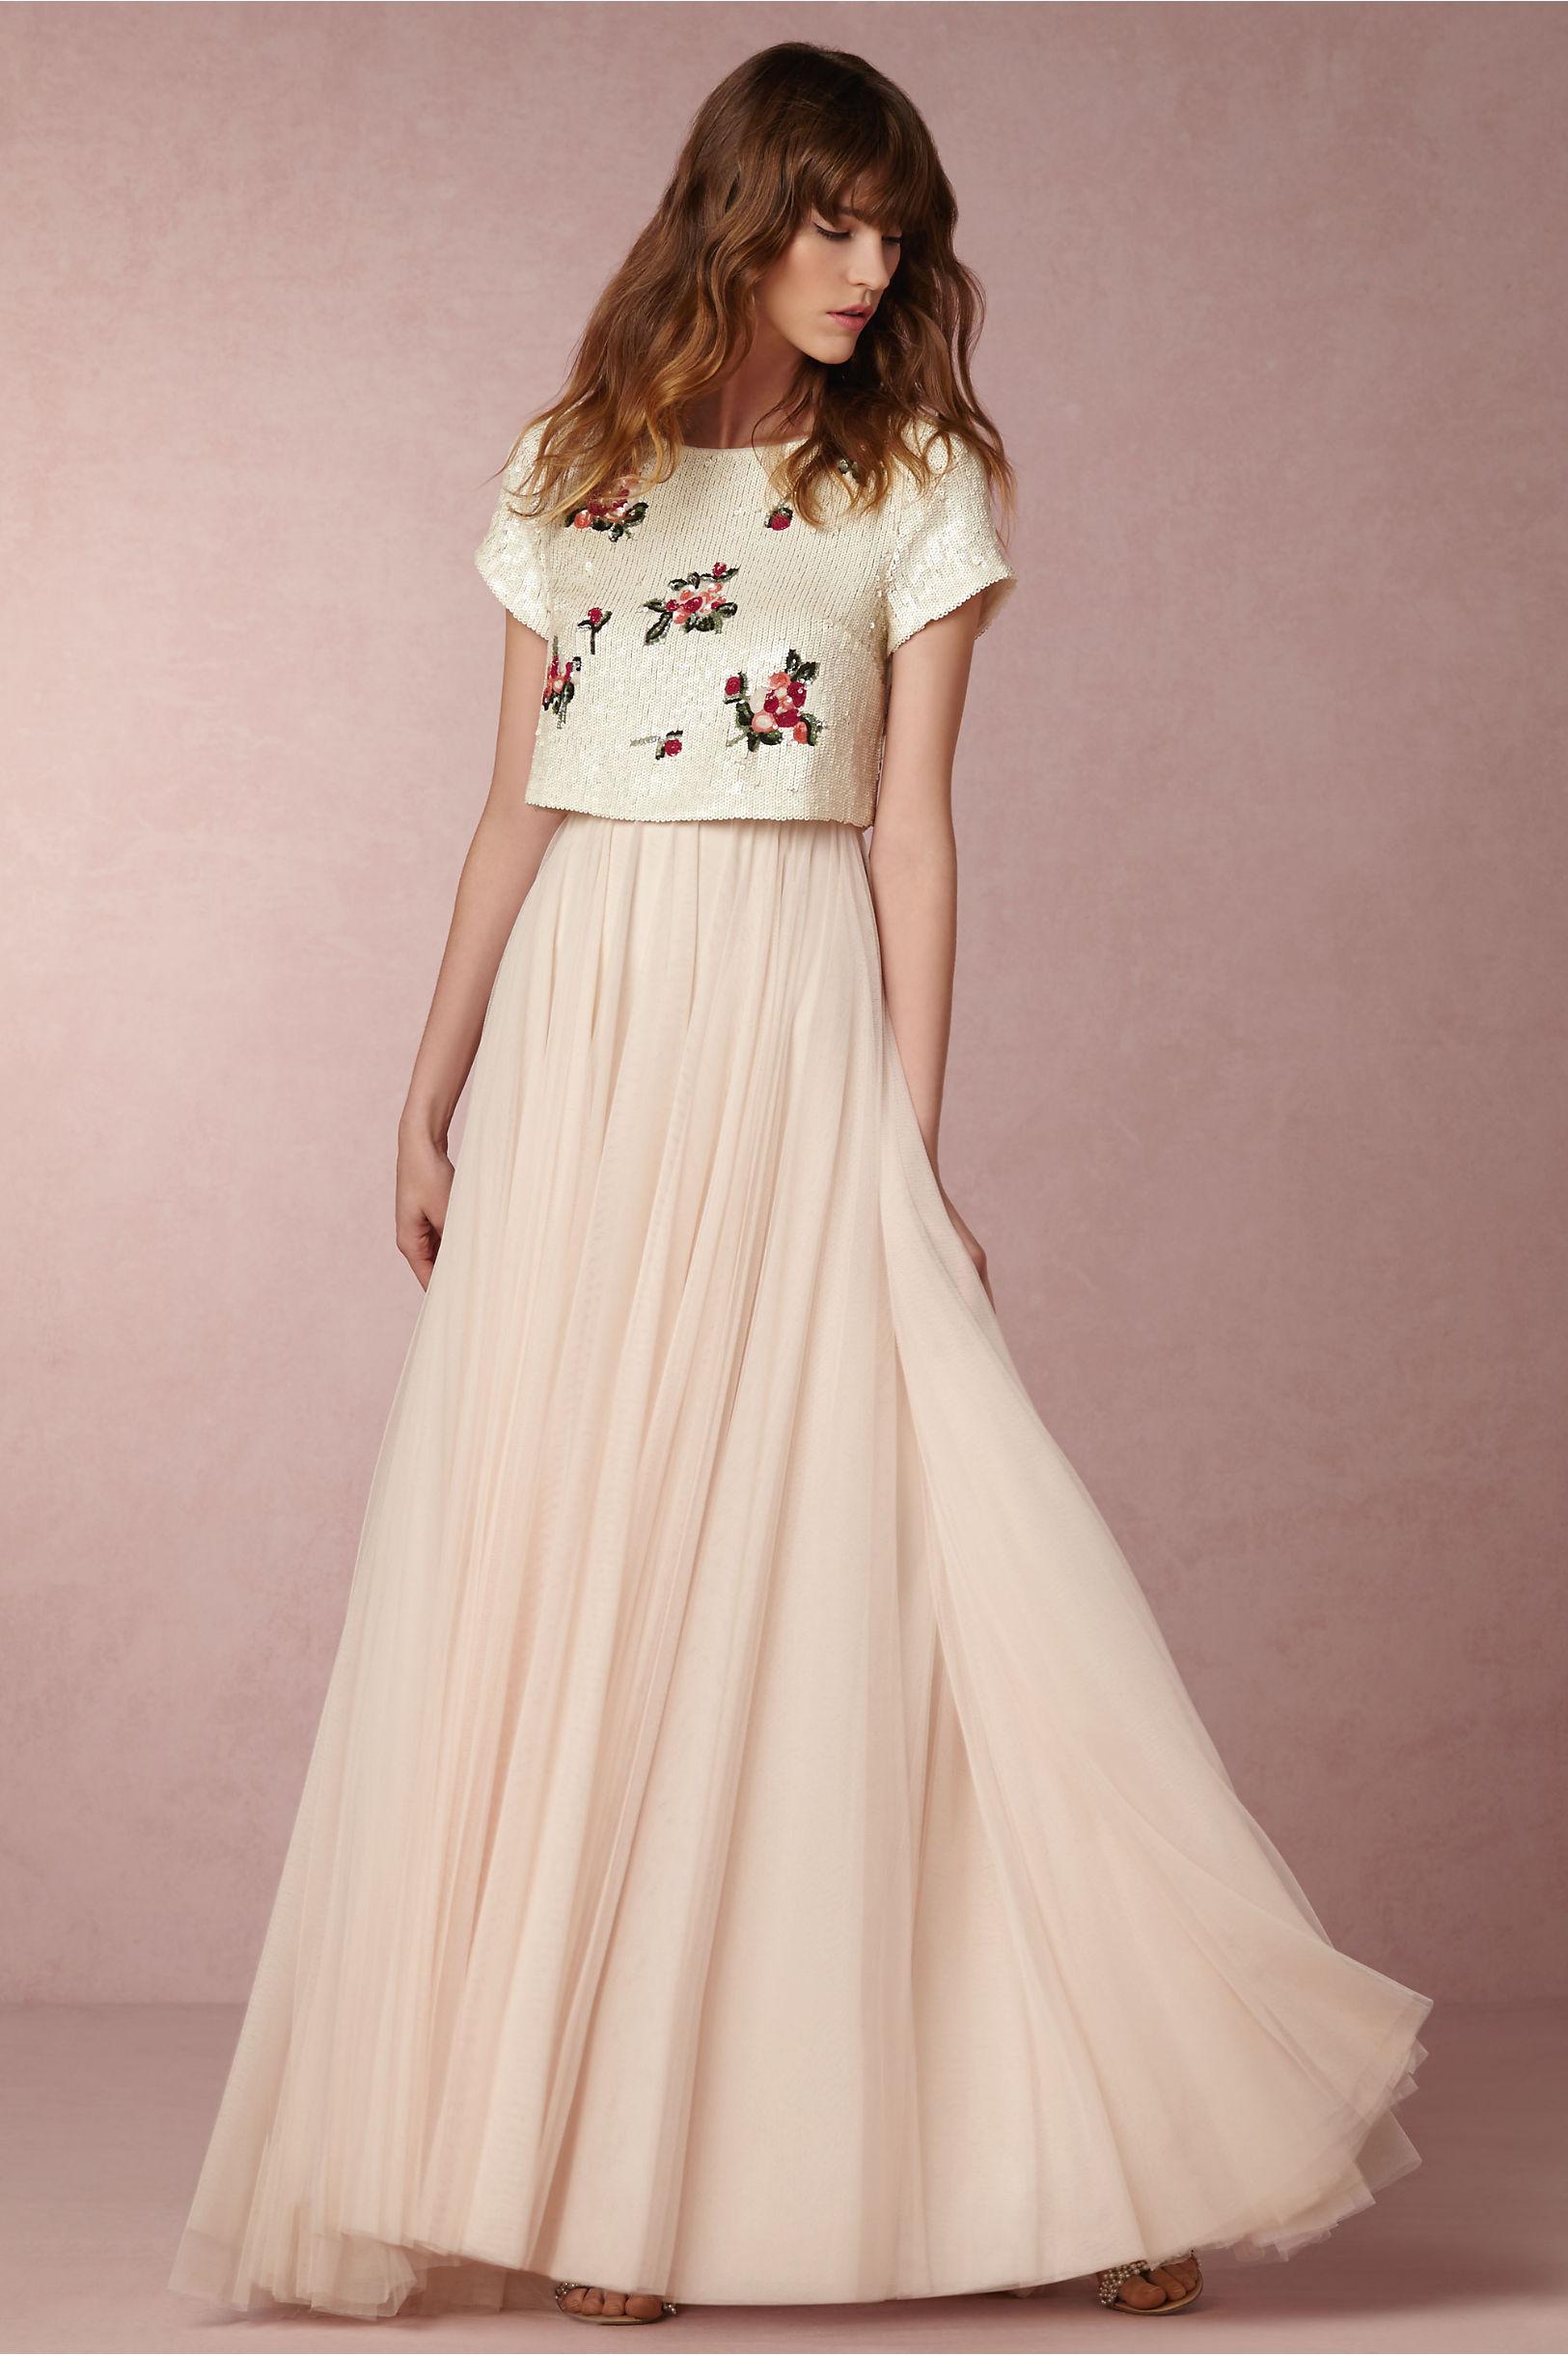 Tulley Top Amora Skirt In Bride